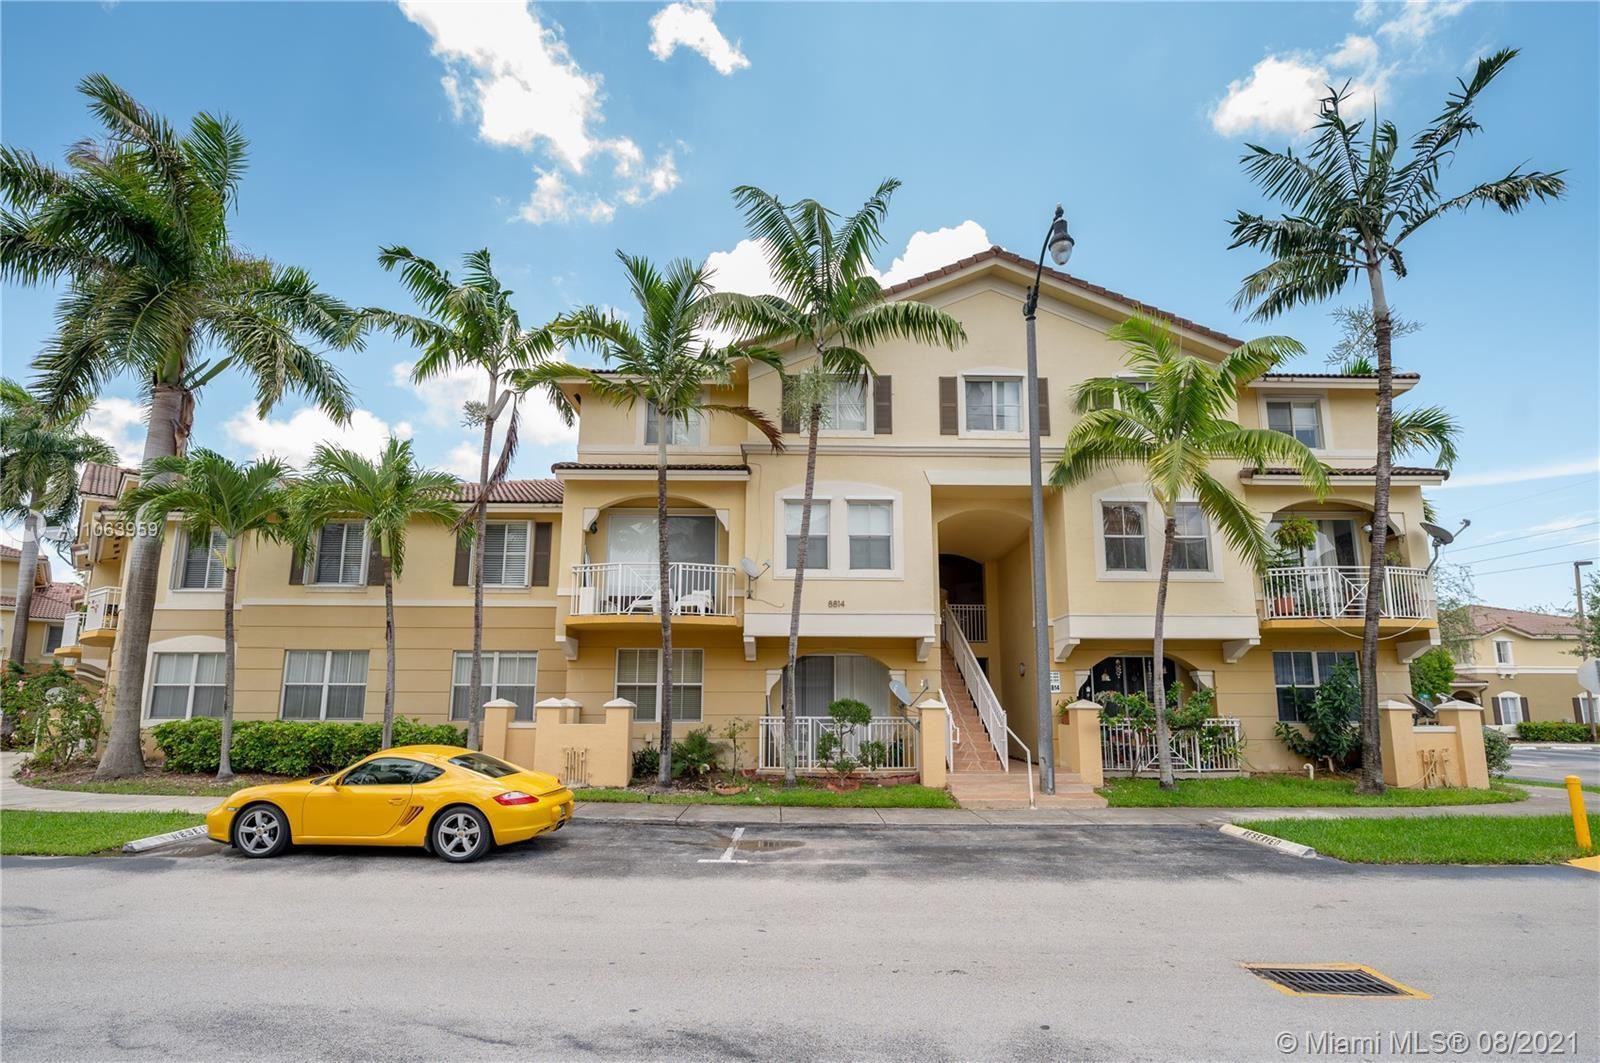 8814 W Flagler St #201, Miami, FL 33174 - #: A11063959